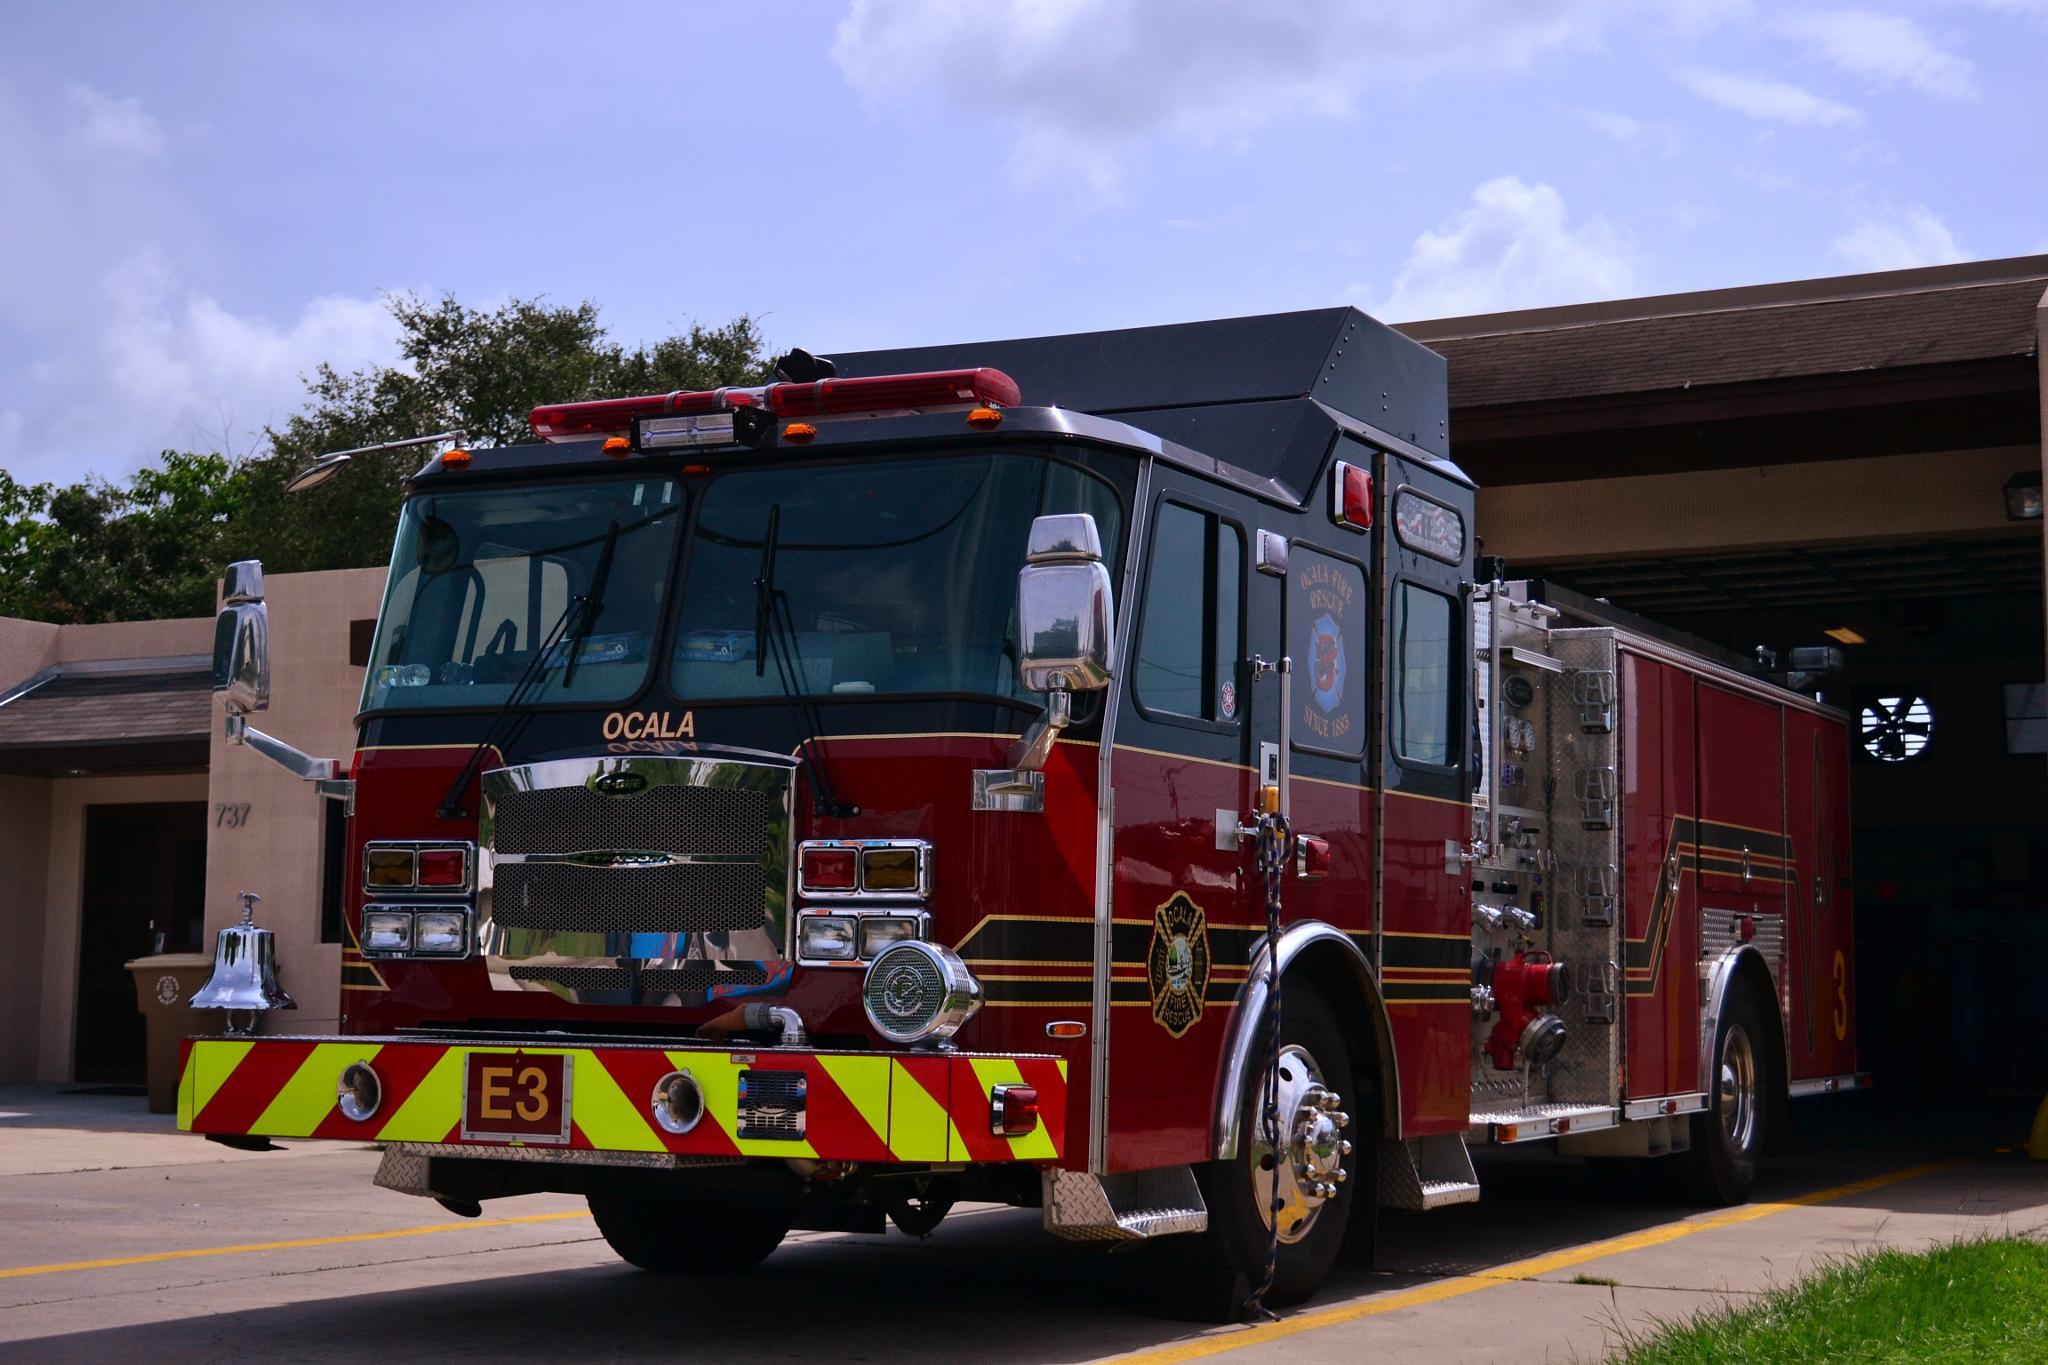 Fire Truck Ocala,Fla by docsmity